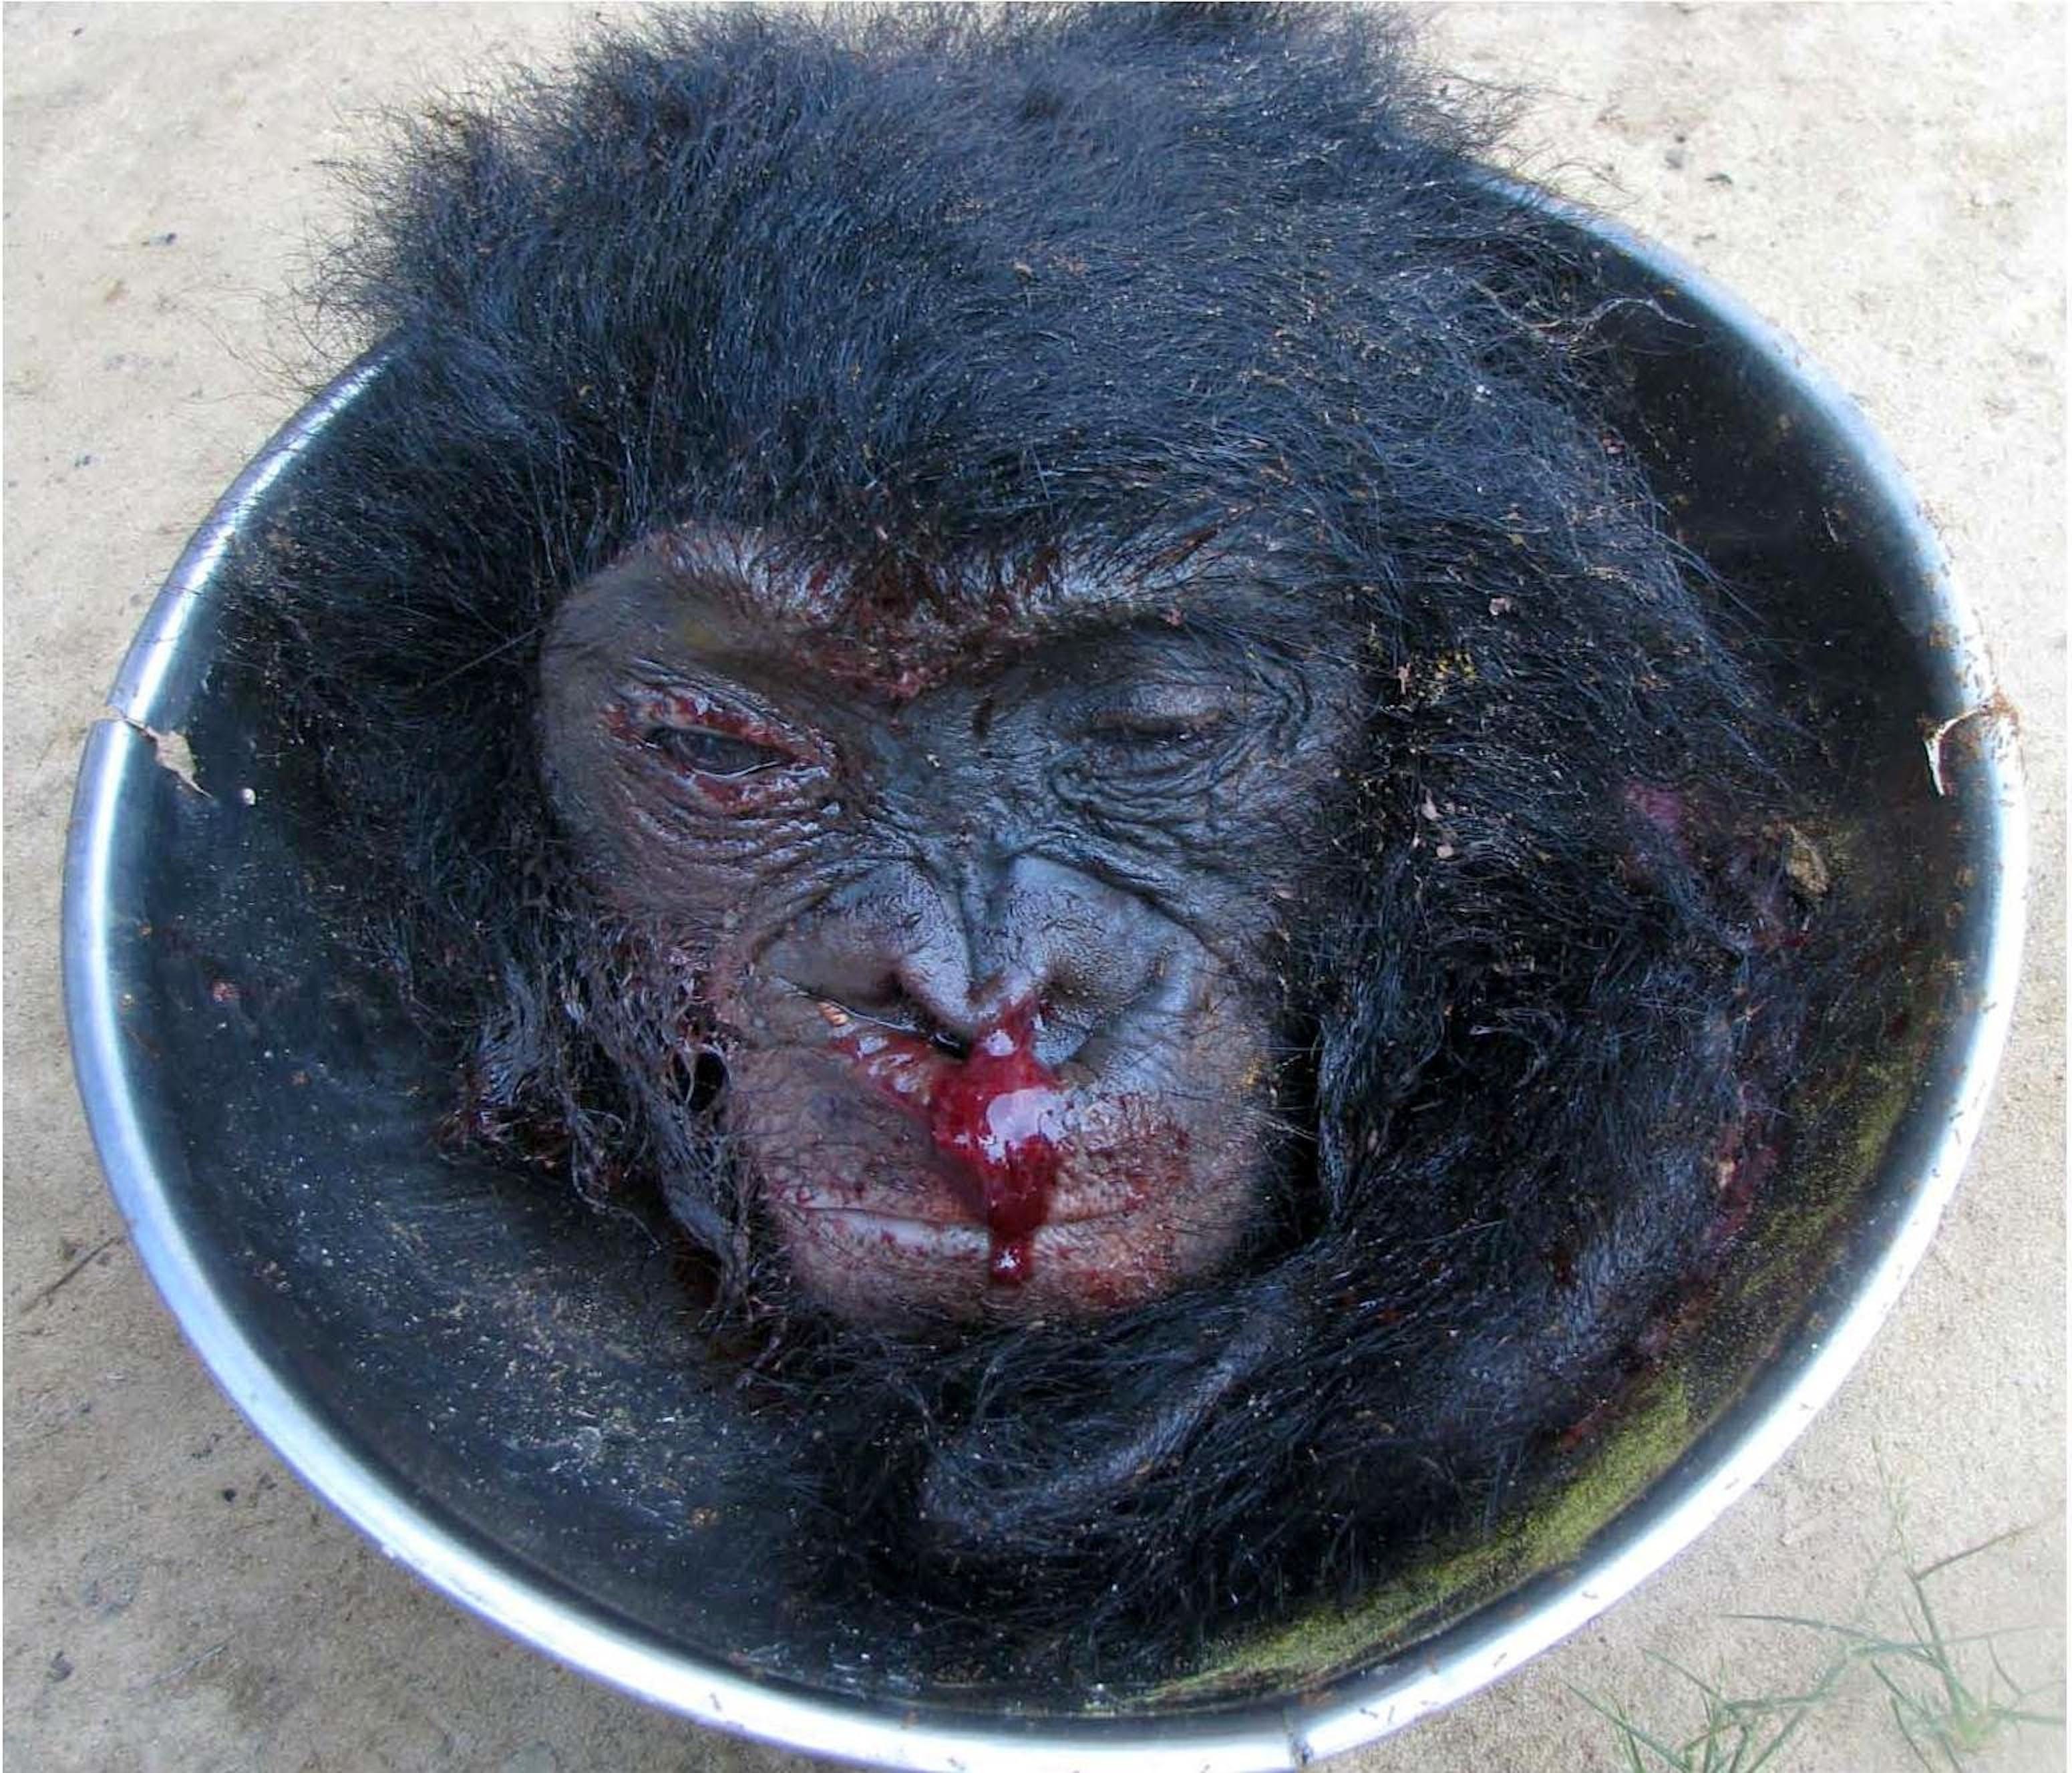 Terese Hart / www.bonoboincongo.com